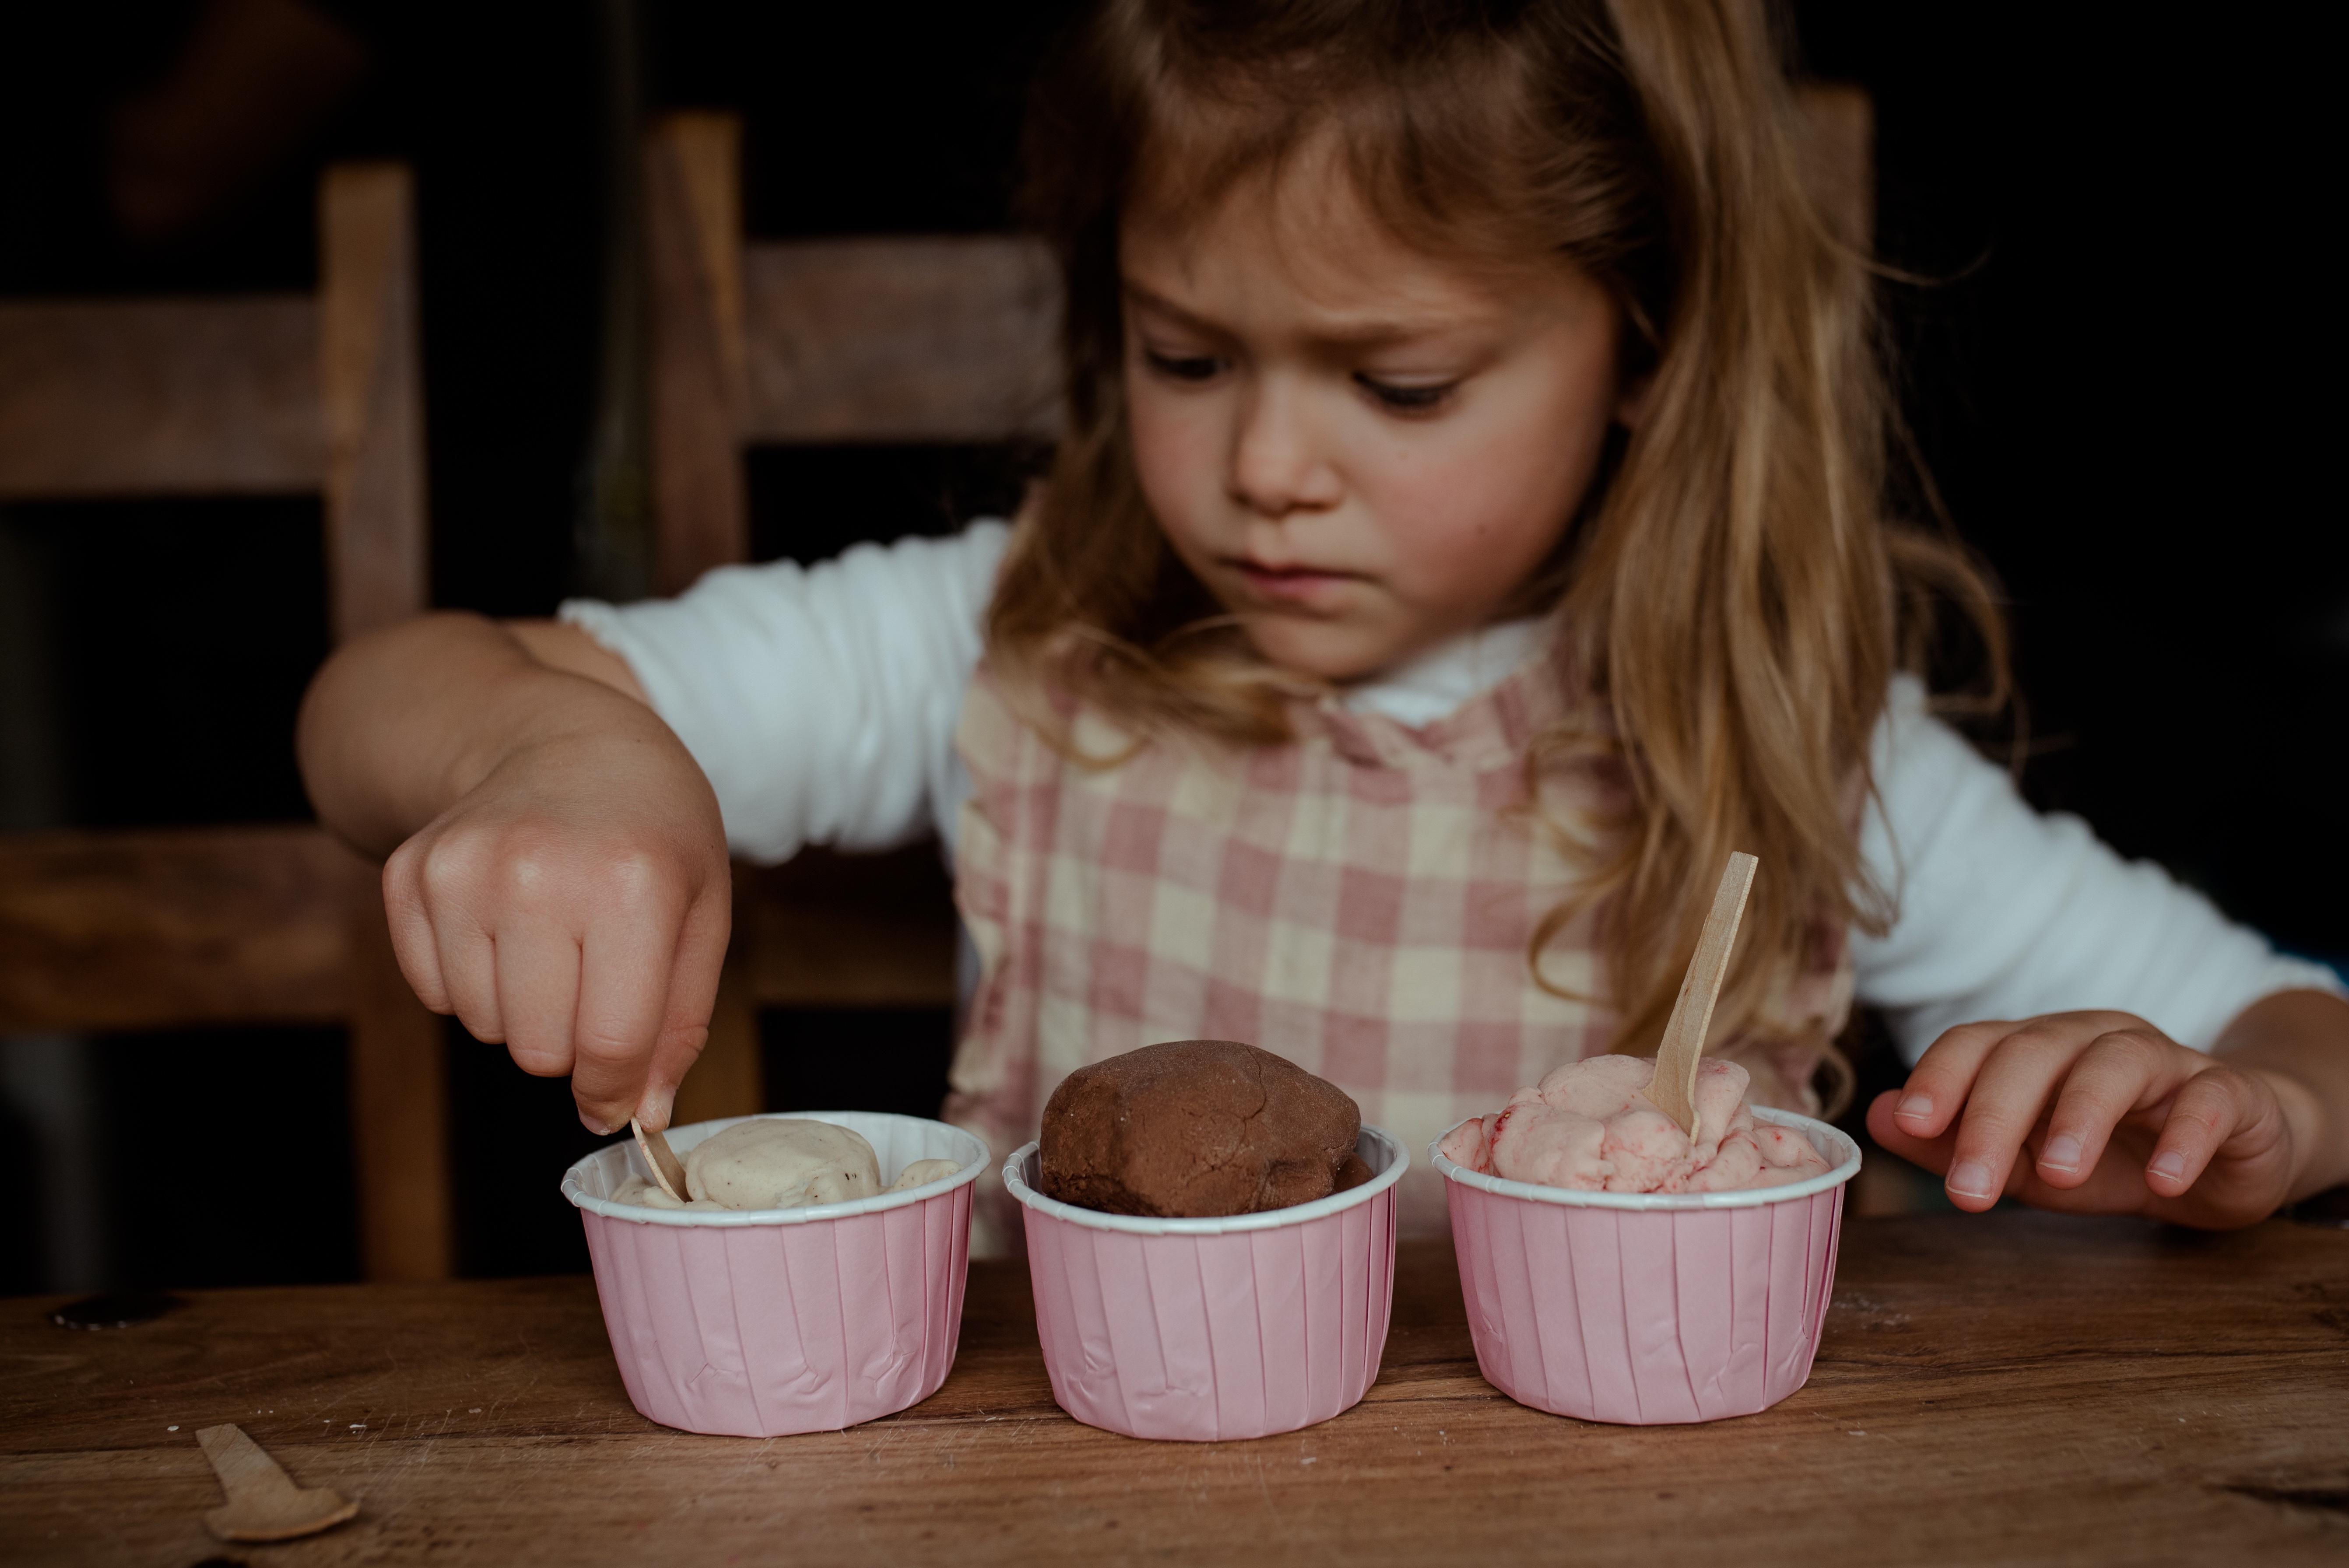 Make Your Own Ice Cream Sensory Dough